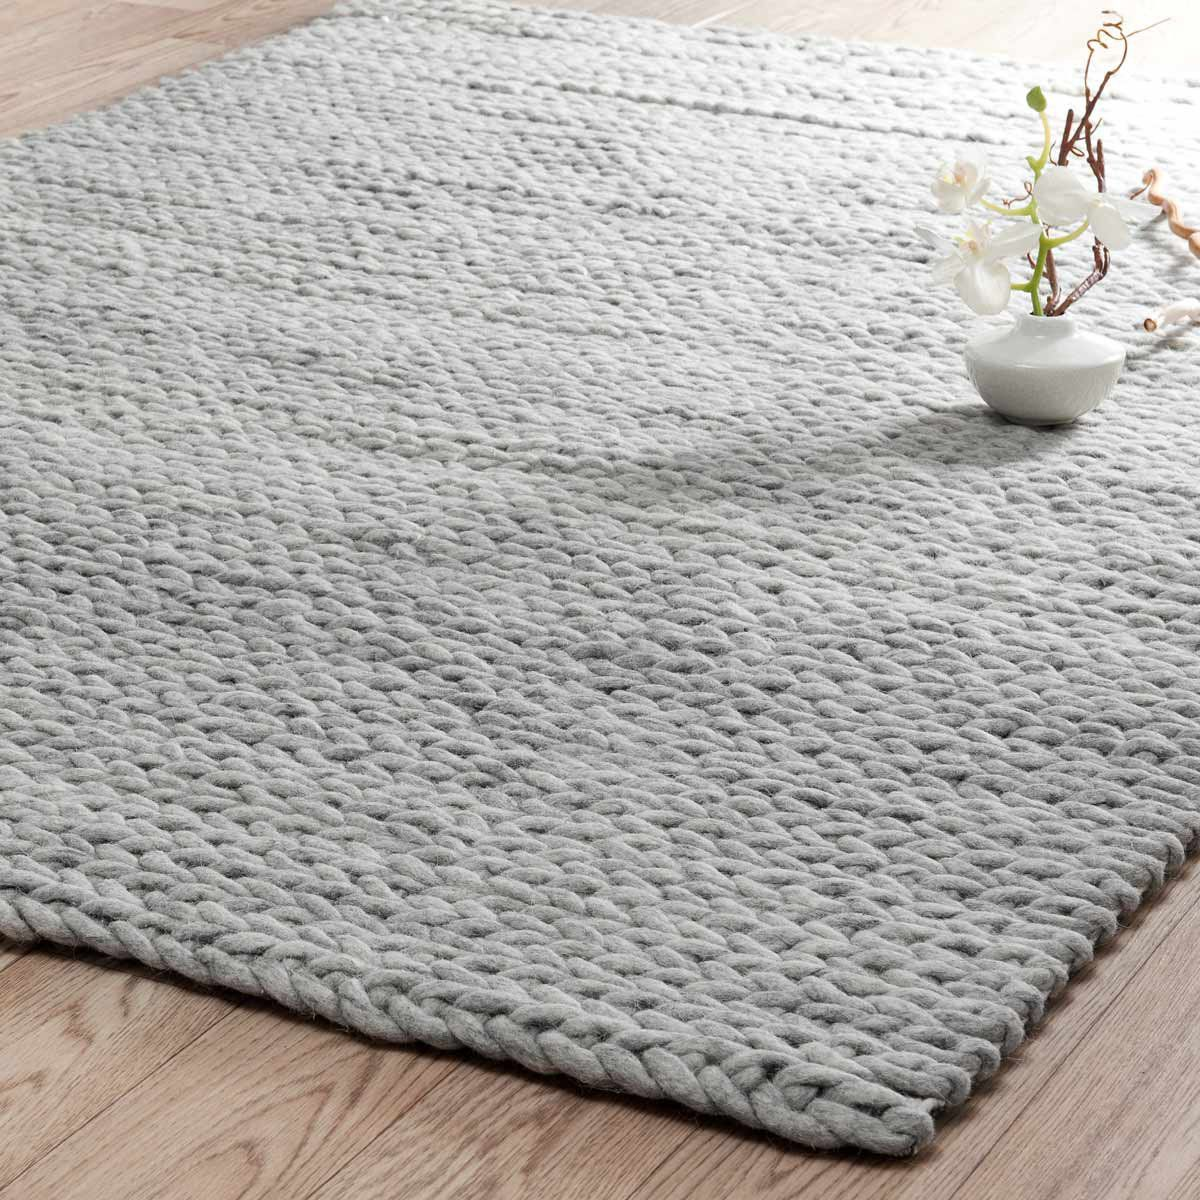 alfombra stocklom gris claro x